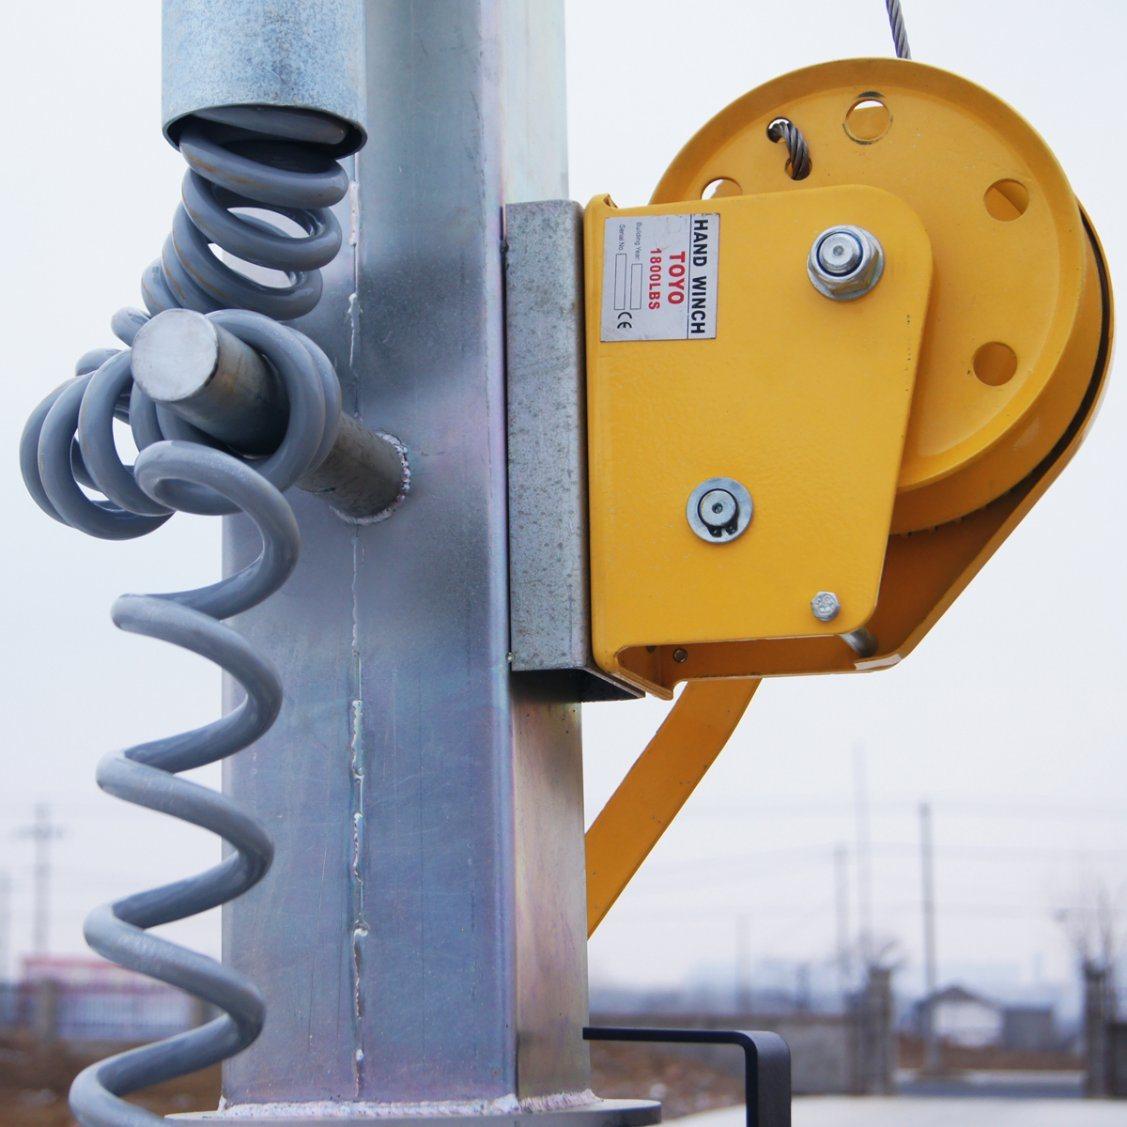 10m Illuminated Mobile Light Tower Powered by Kutoba/Perkins/Kholer